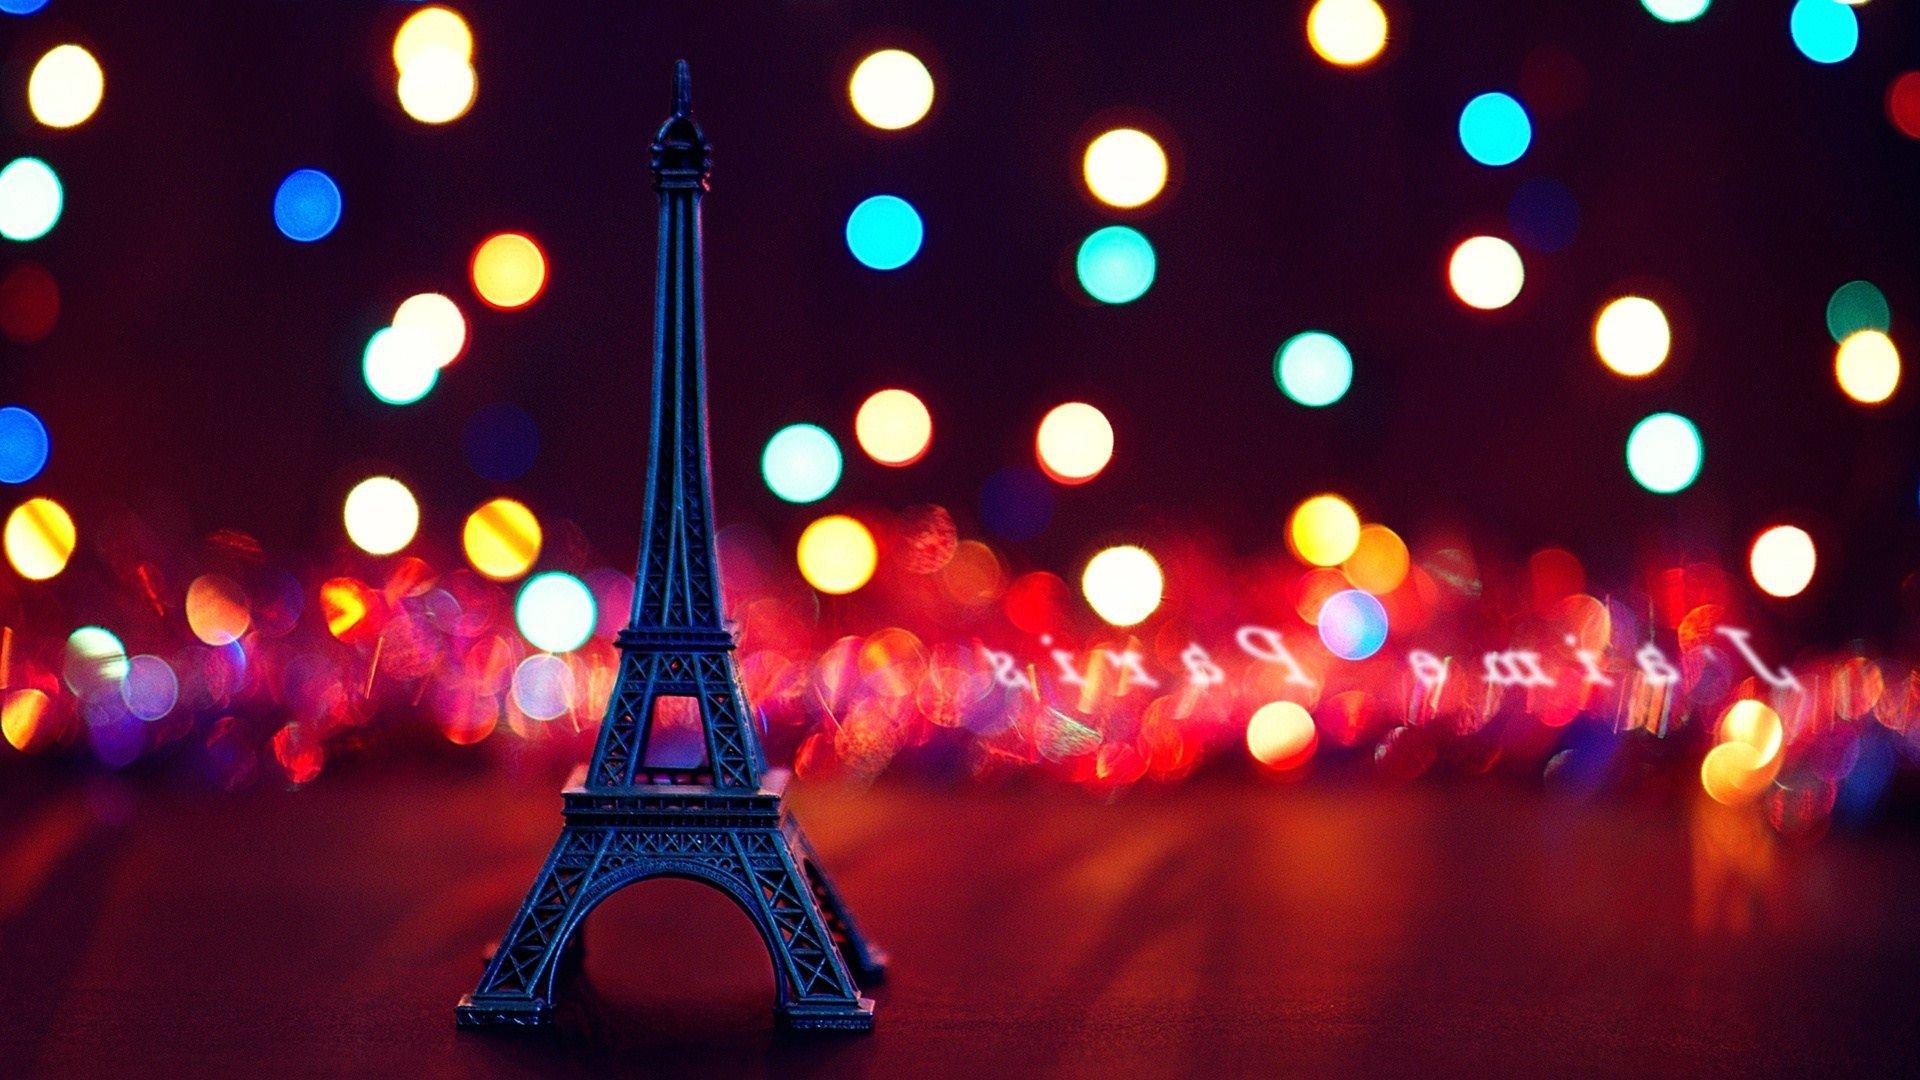 46 ] Cute Eiffel Tower Wallpapers On WallpaperSafari